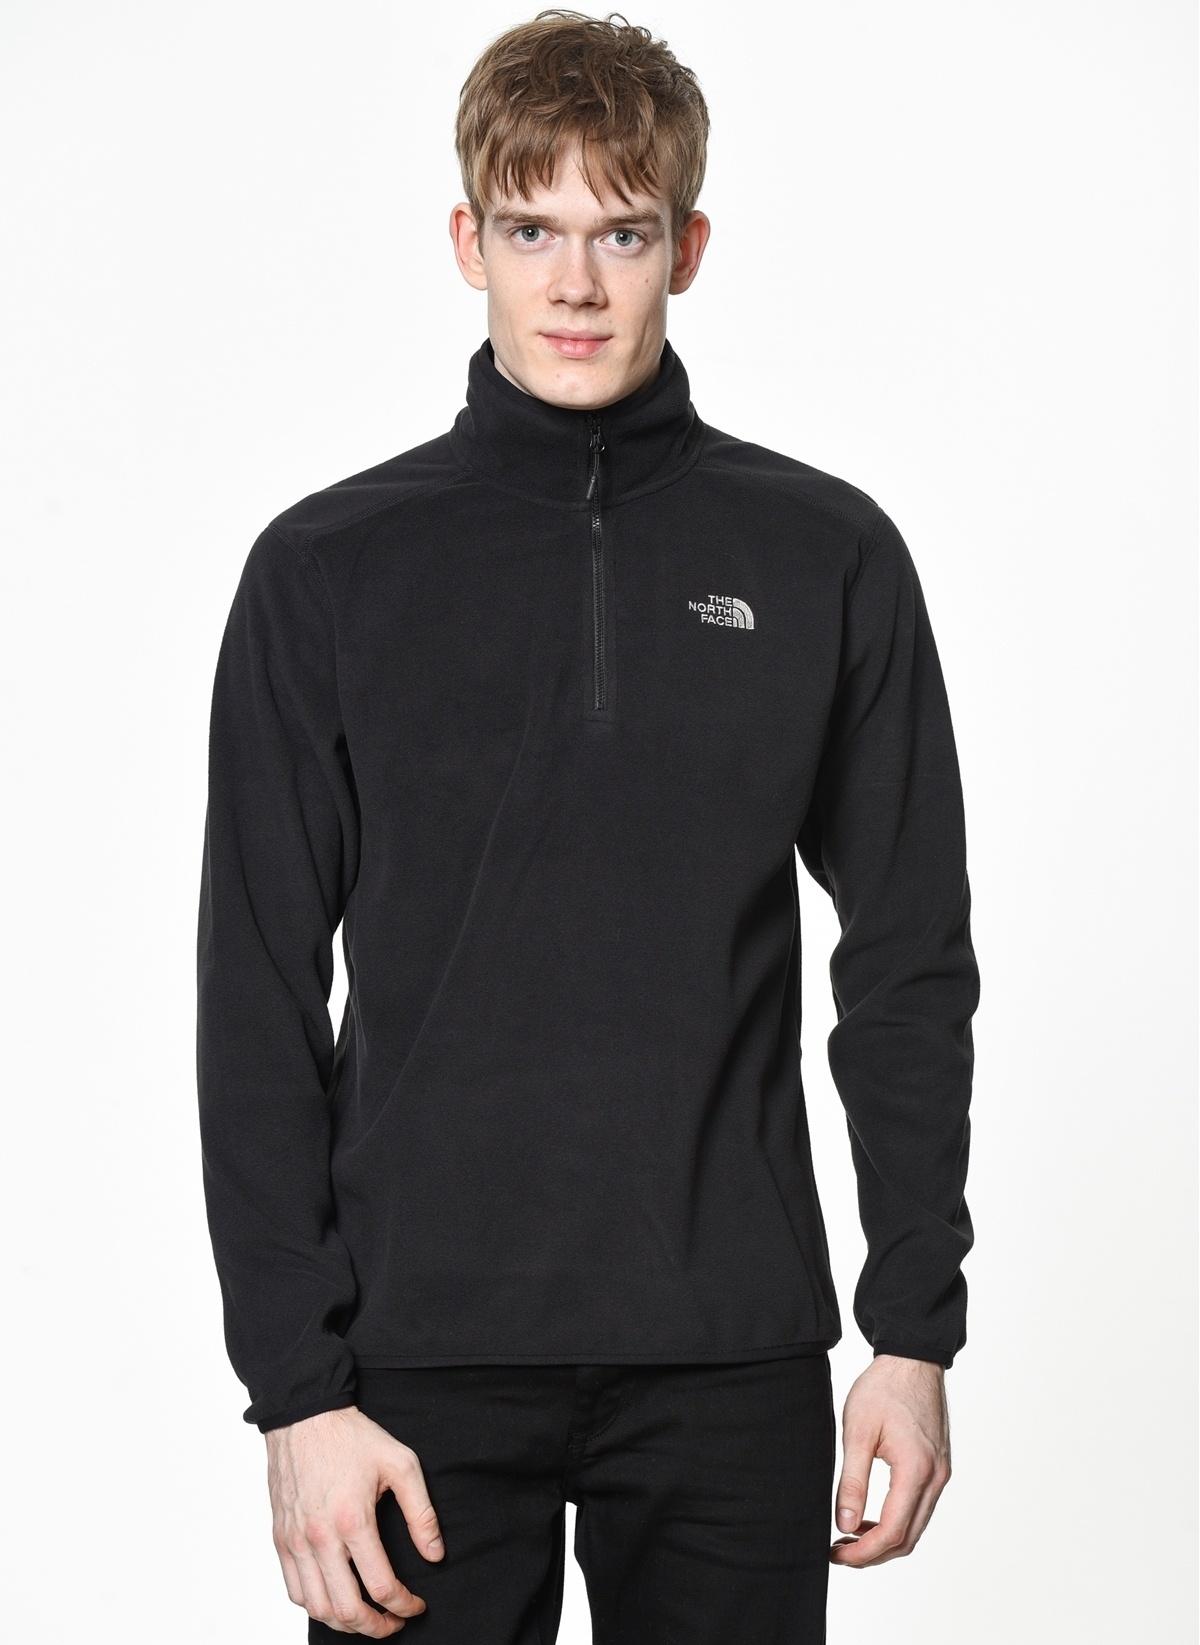 The North Face Sweatshirt T92uarjk3 The North Face Polar Sweatshır – 385.0 TL